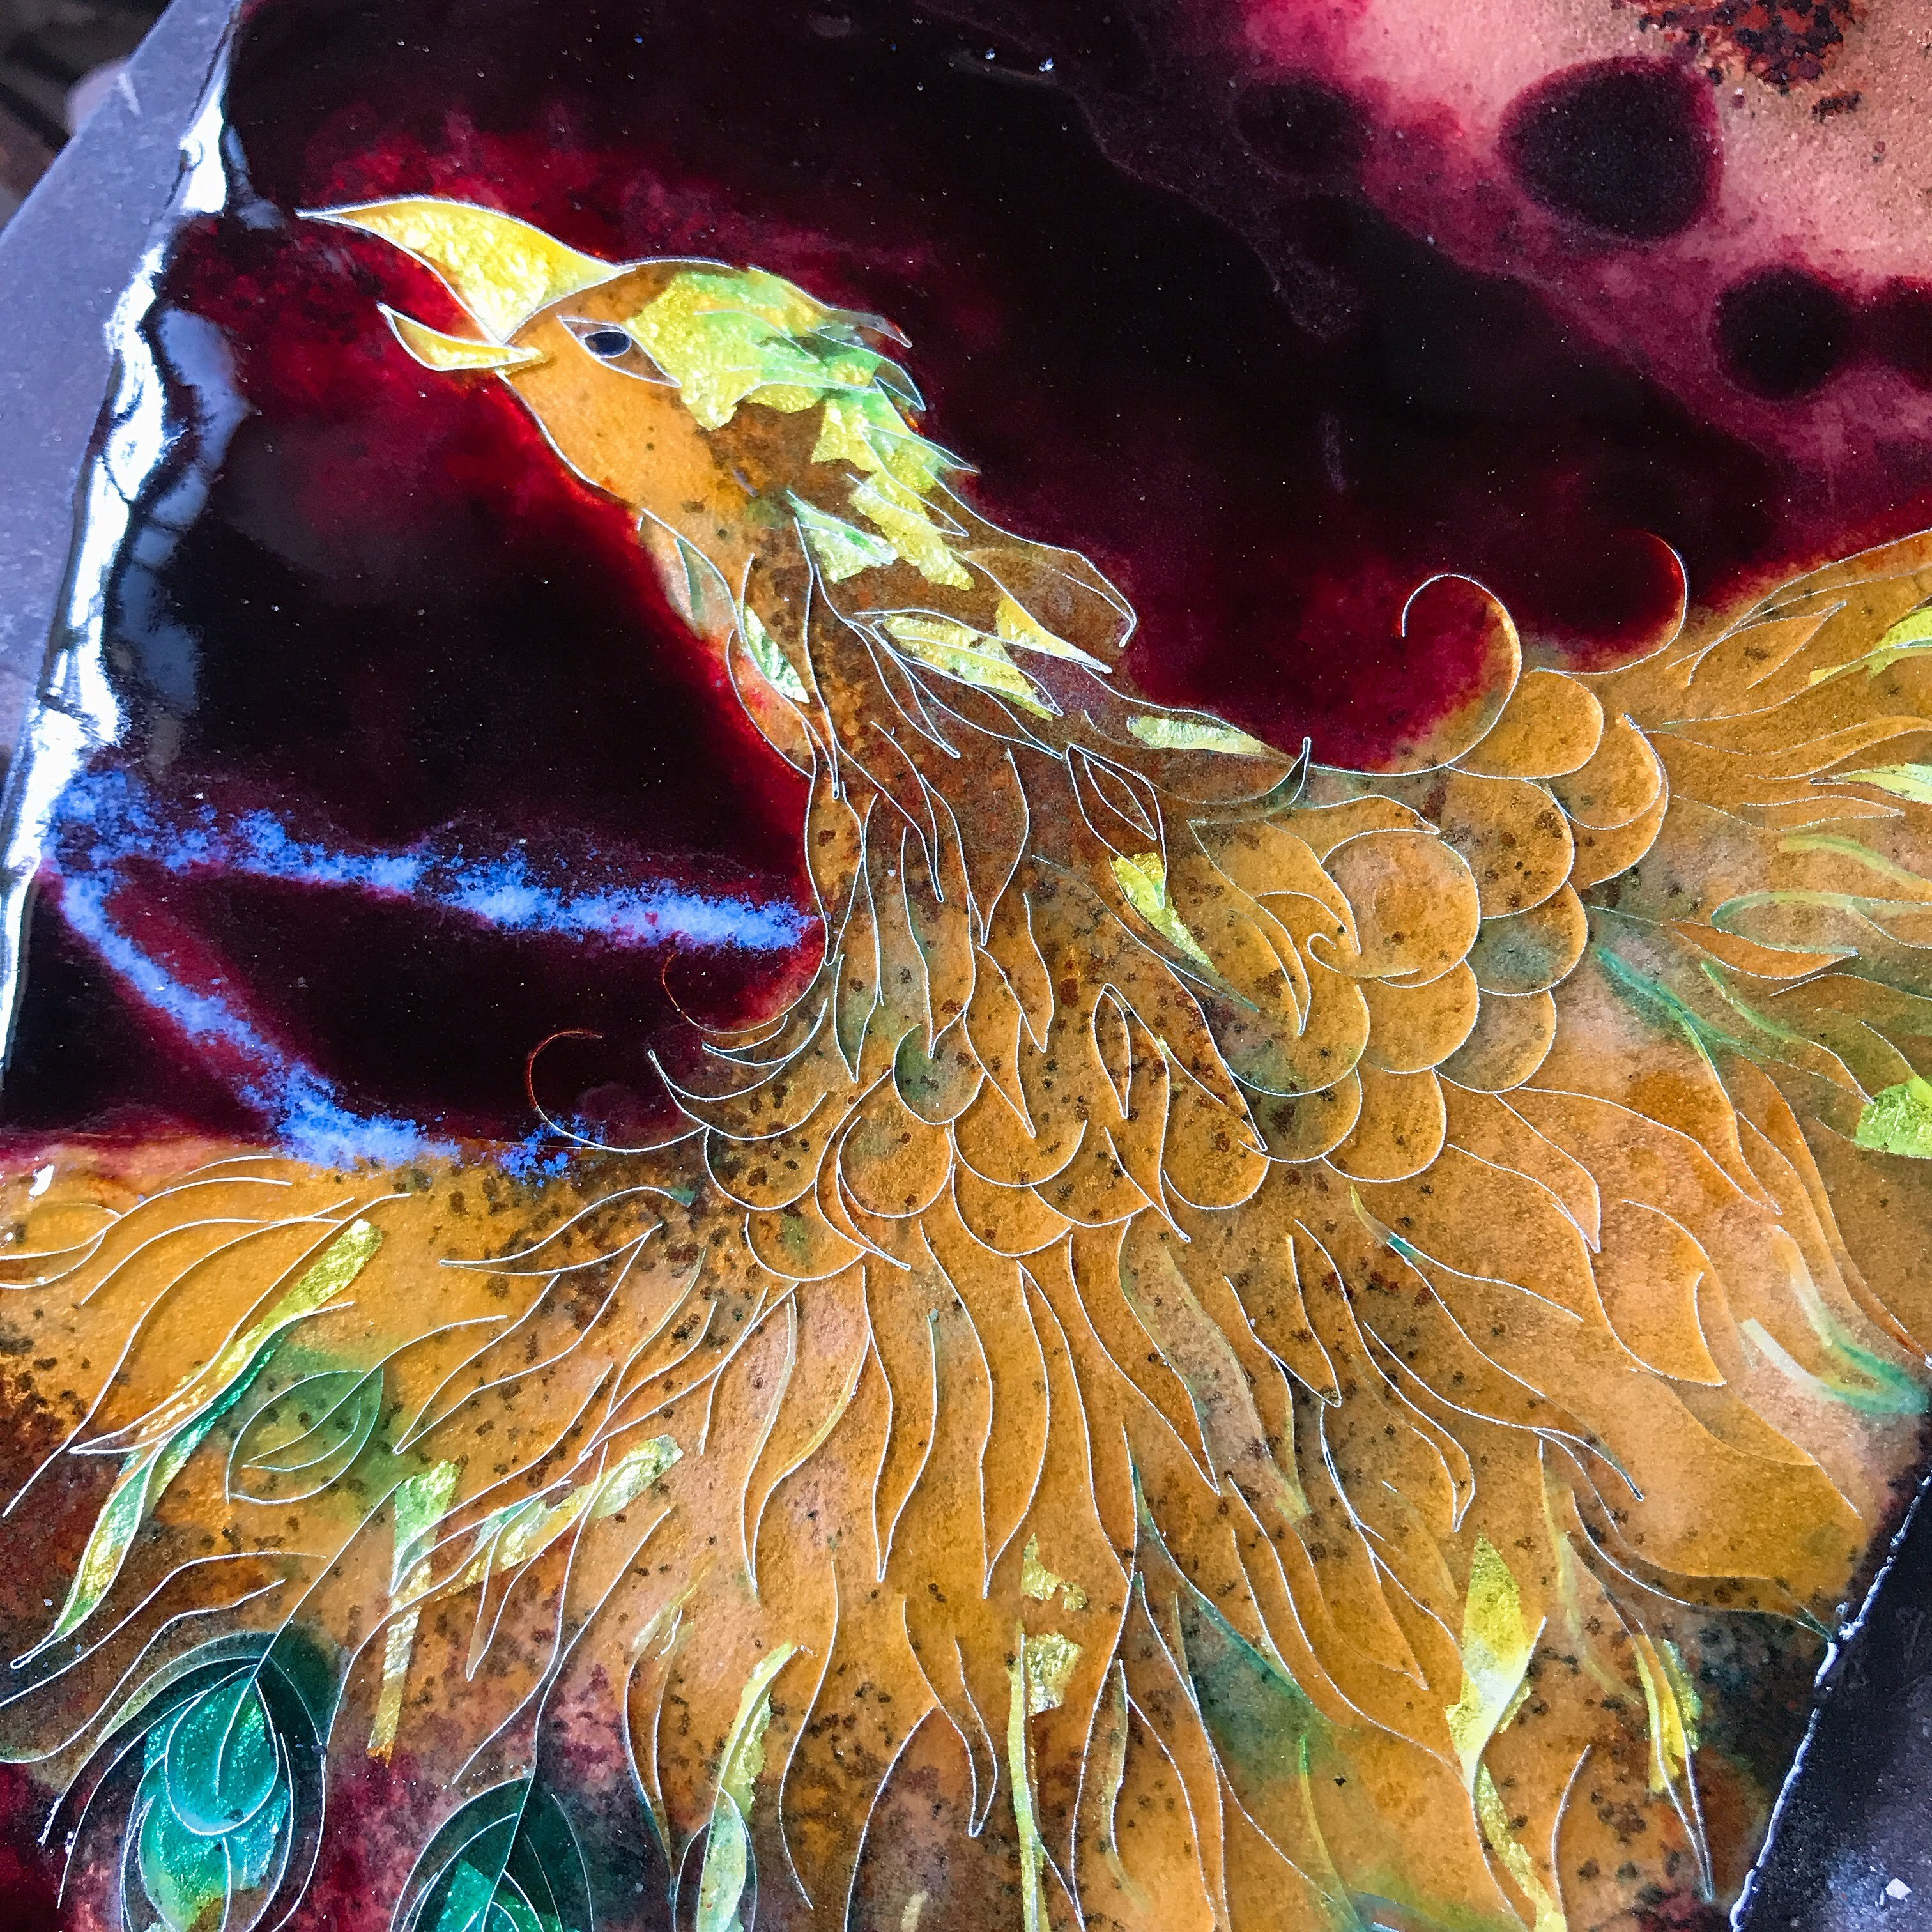 七宝変形平面作品 火の鳥